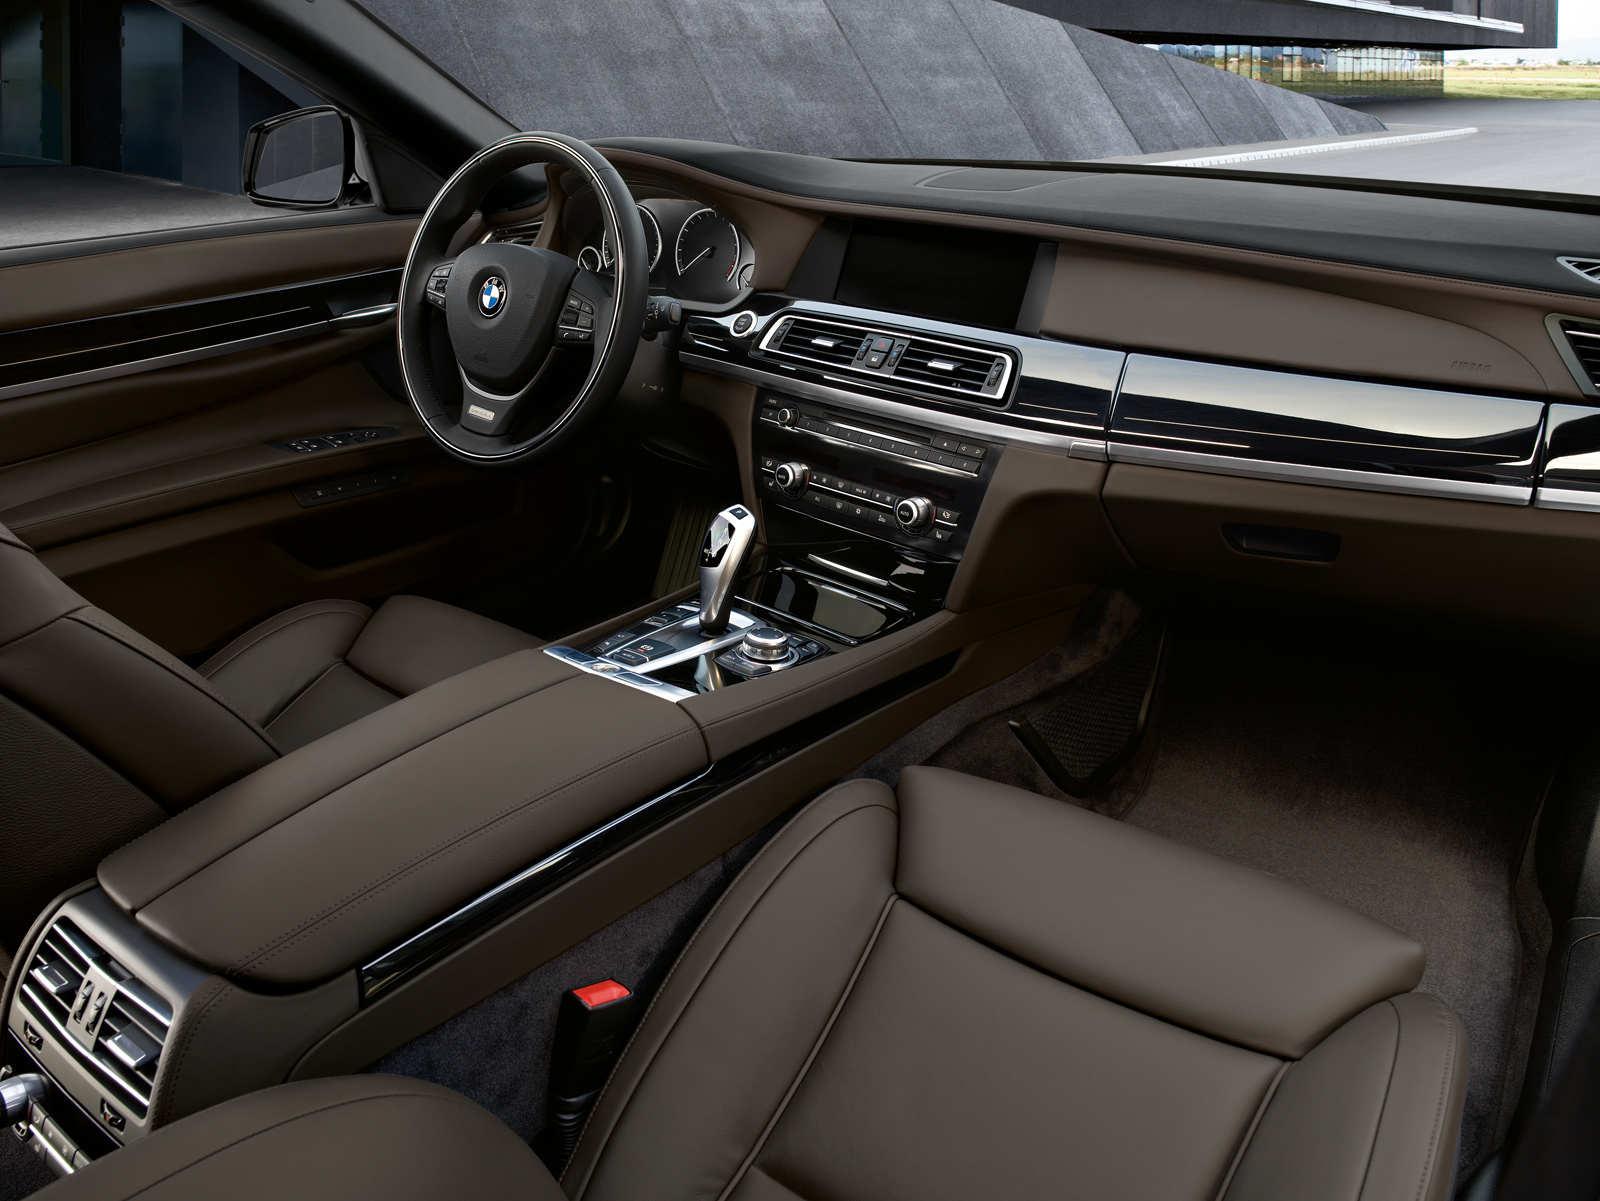 BMW F01 Cockpit